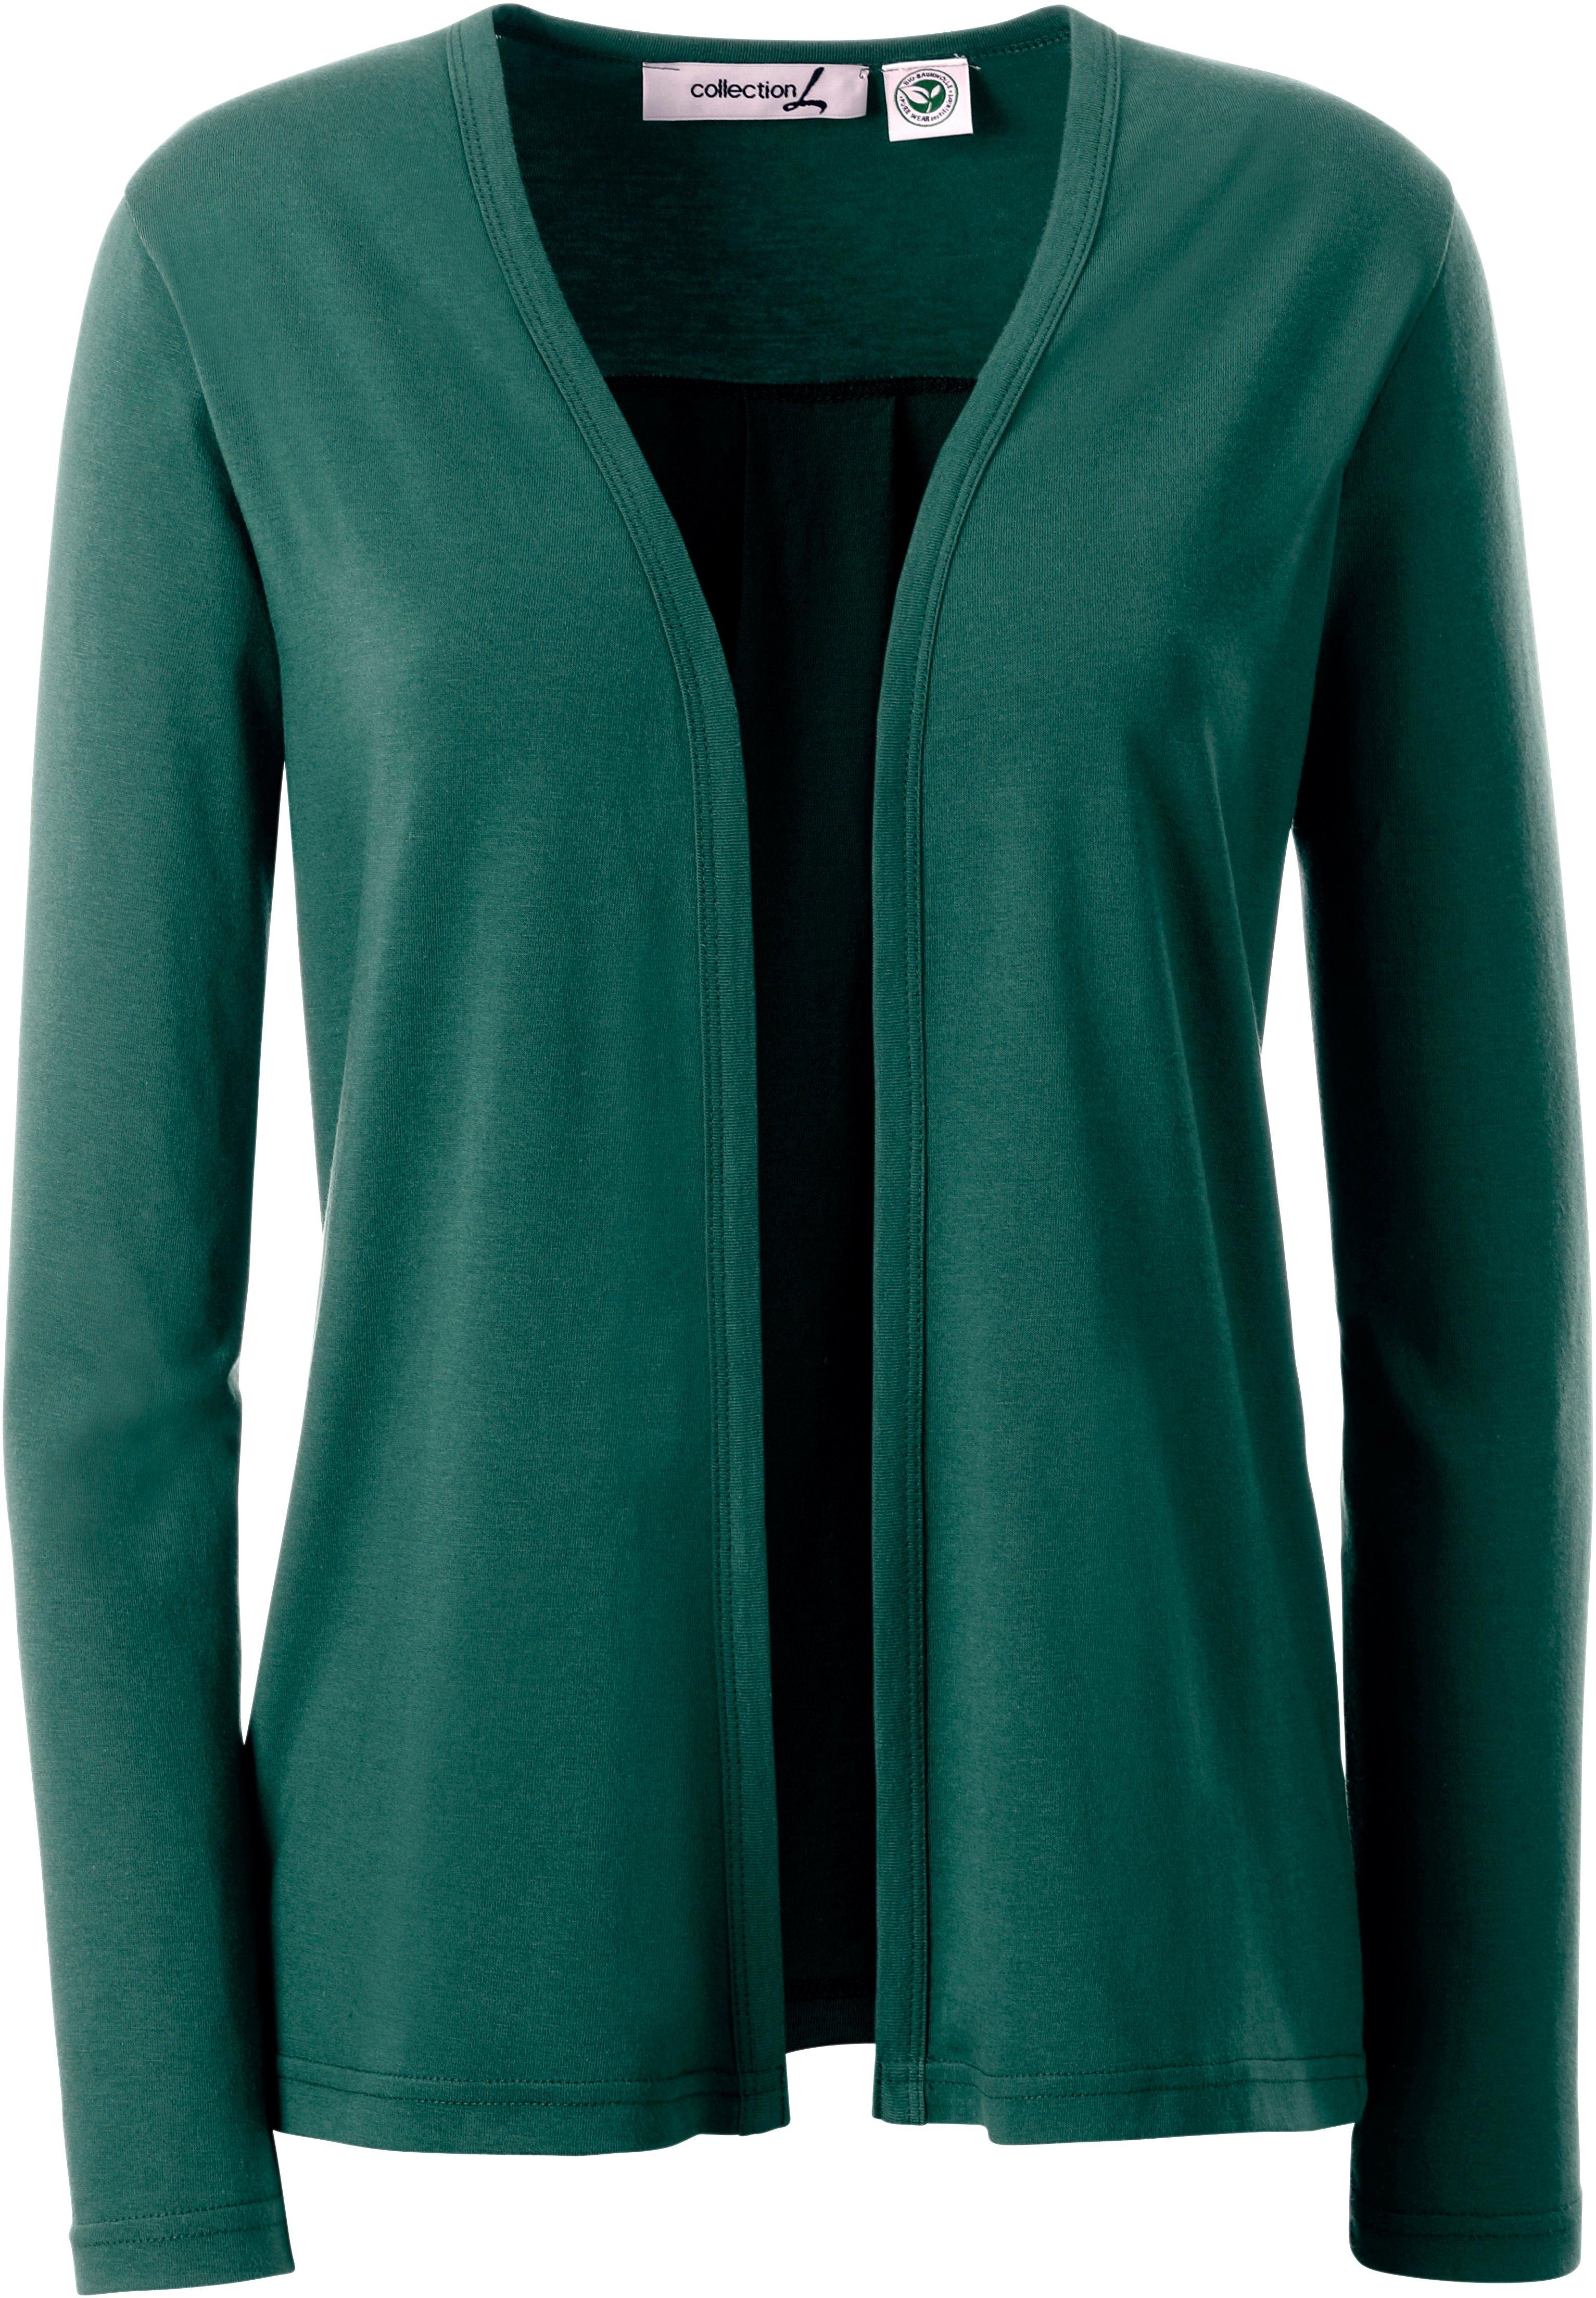 Casual Looks shirtjasje in heerlijk zachte PUREWEAR-kwaliteit - gratis ruilen op otto.nl